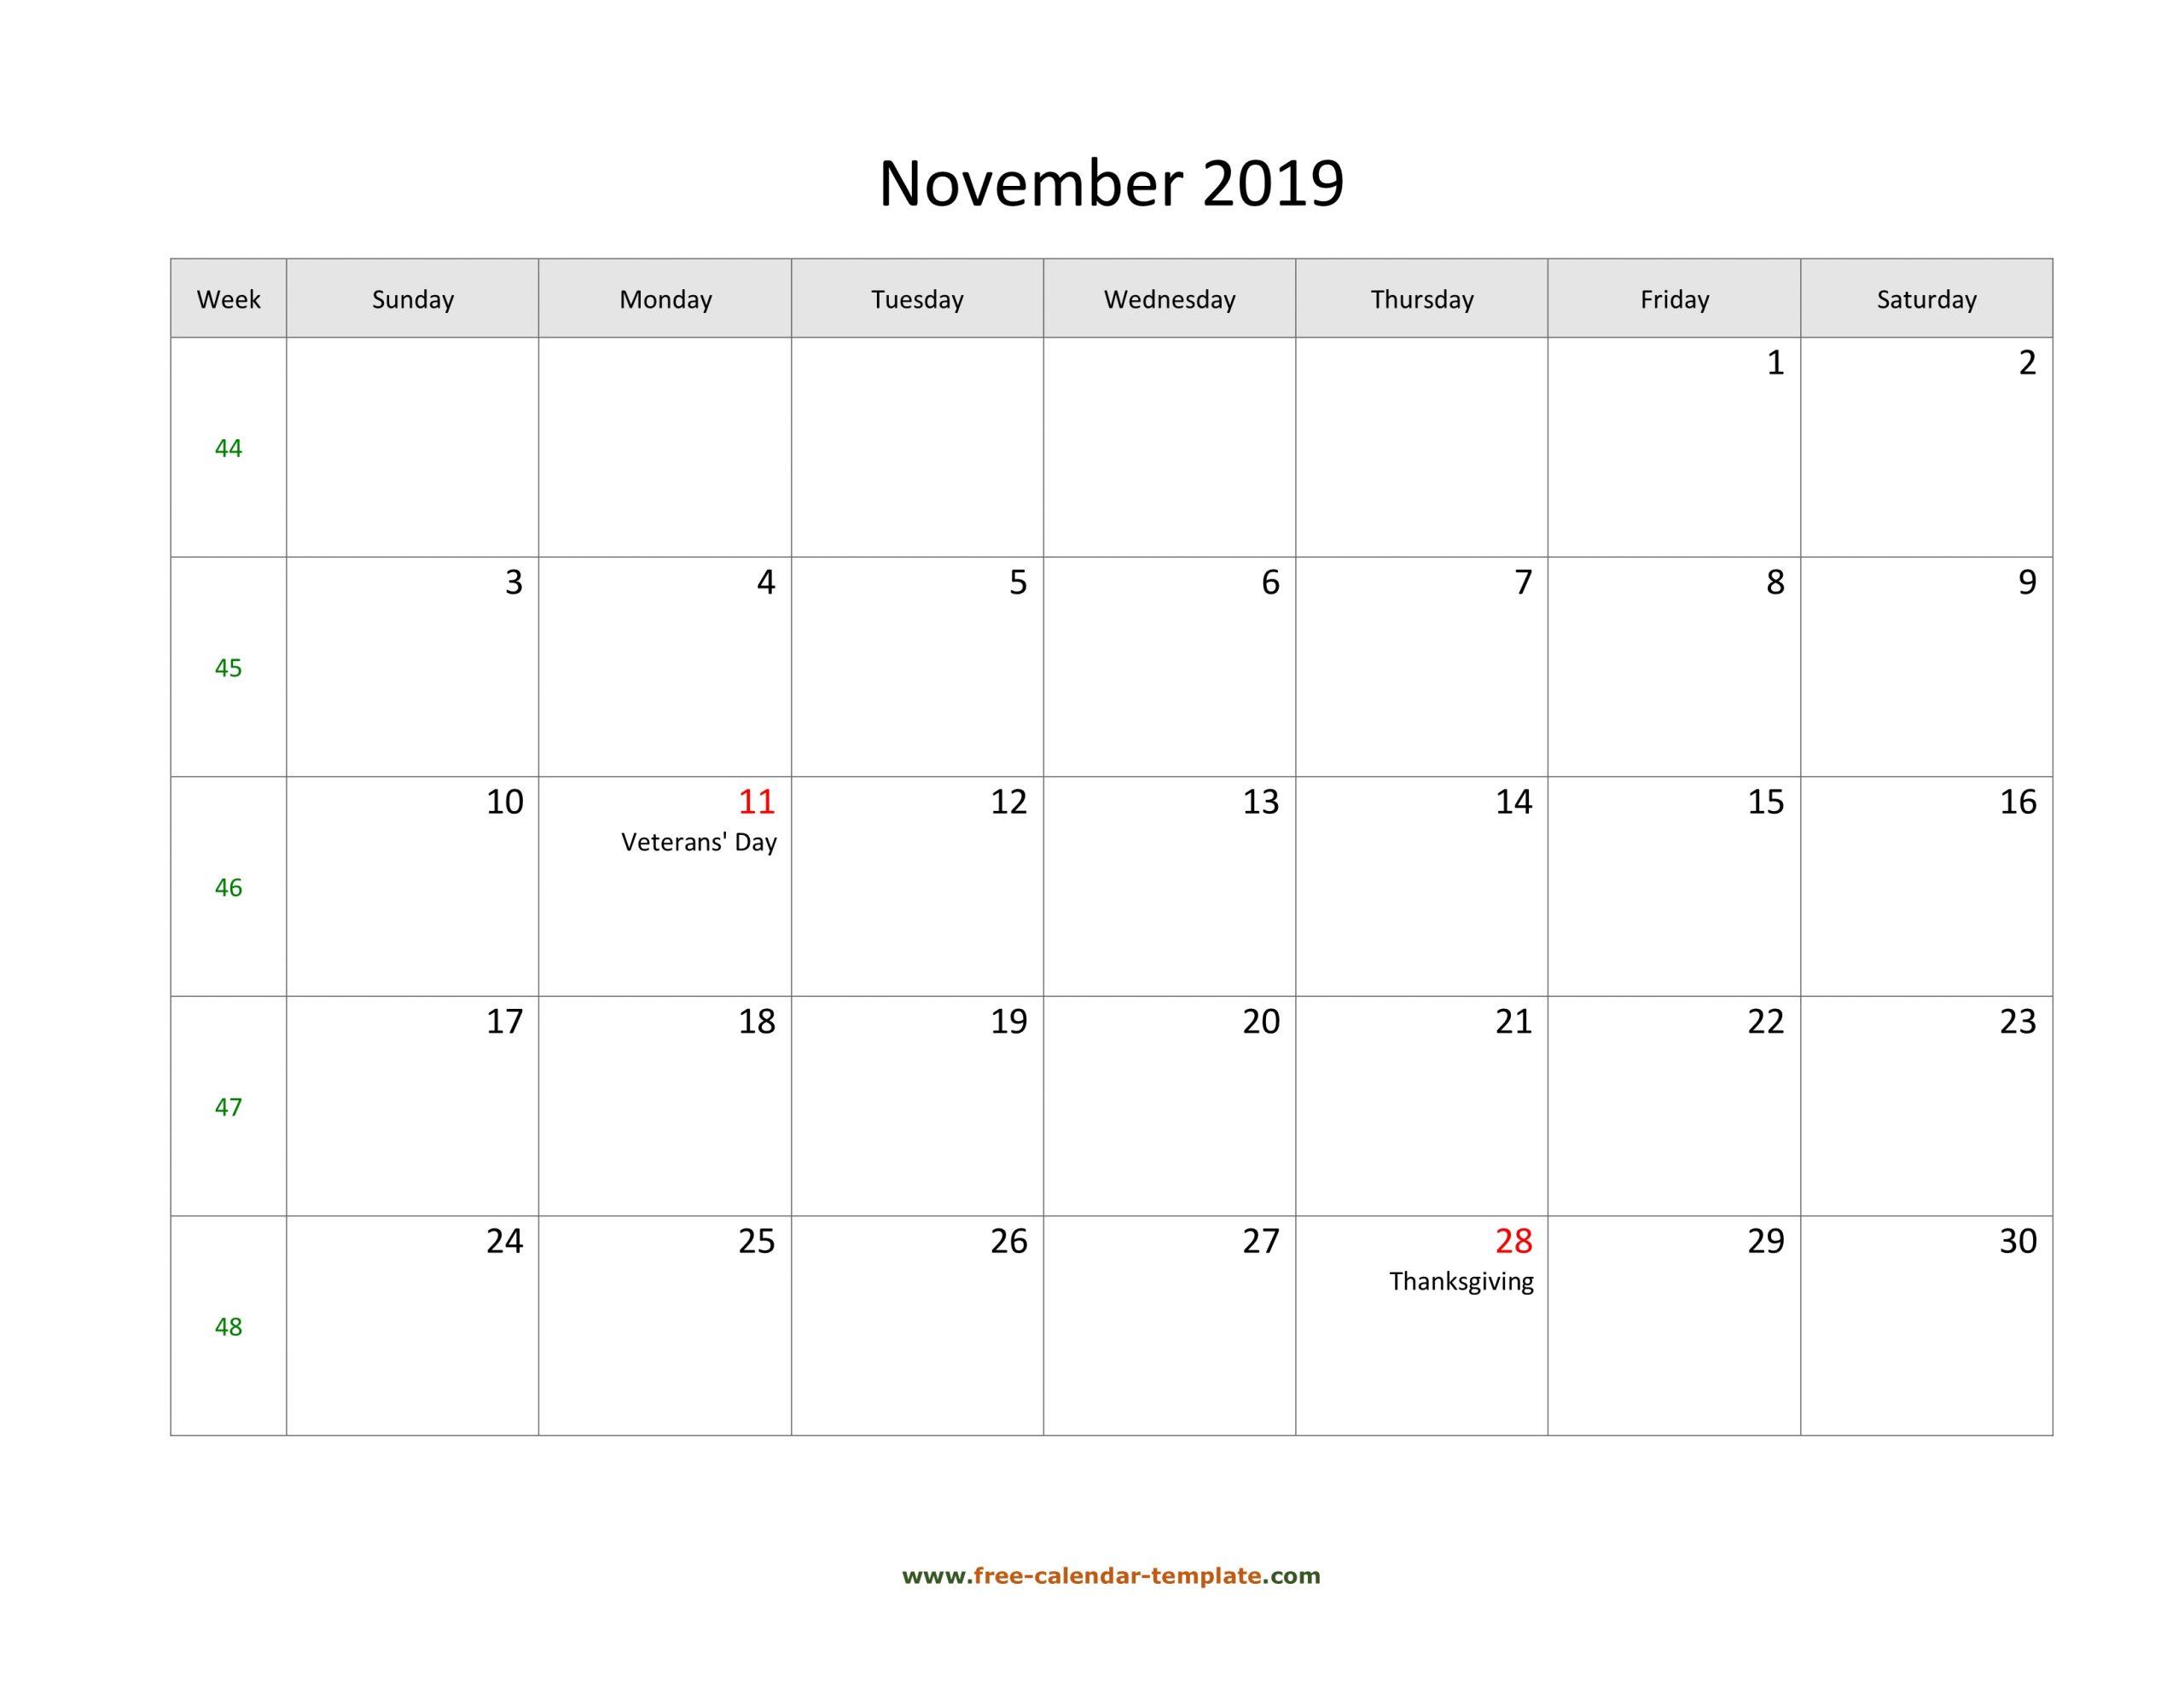 Free 2019 Calendar Blank November Template (Horizontal